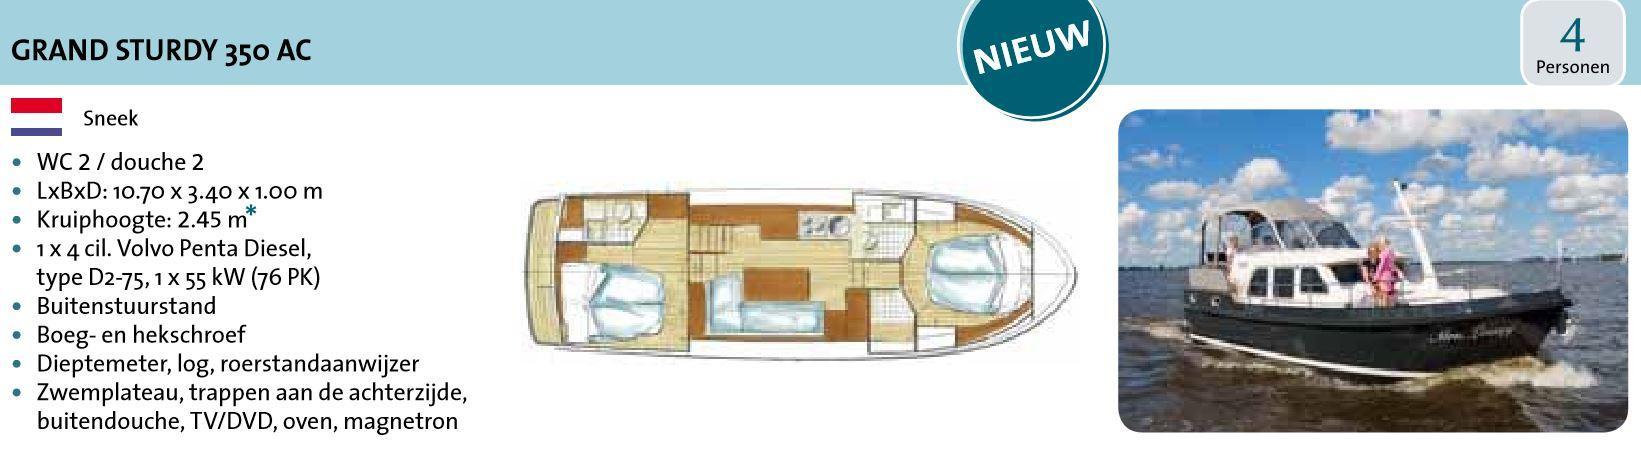 Linssen Grand Sturdy 350 Ac Bboat